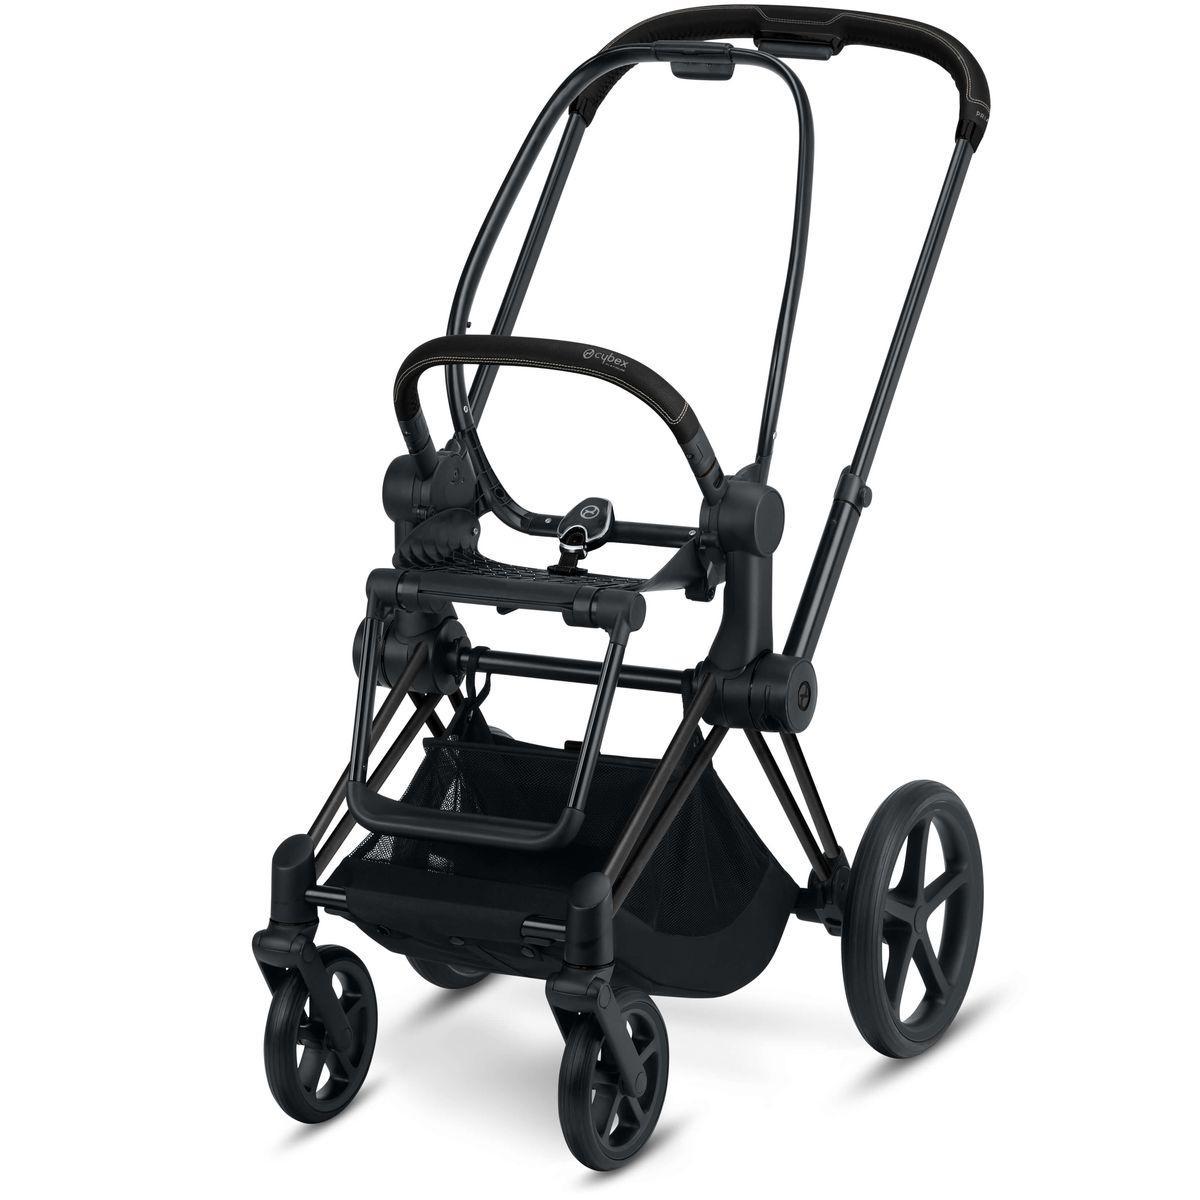 Chasis de carrito eléctrico ePRIAM Cybex matt black